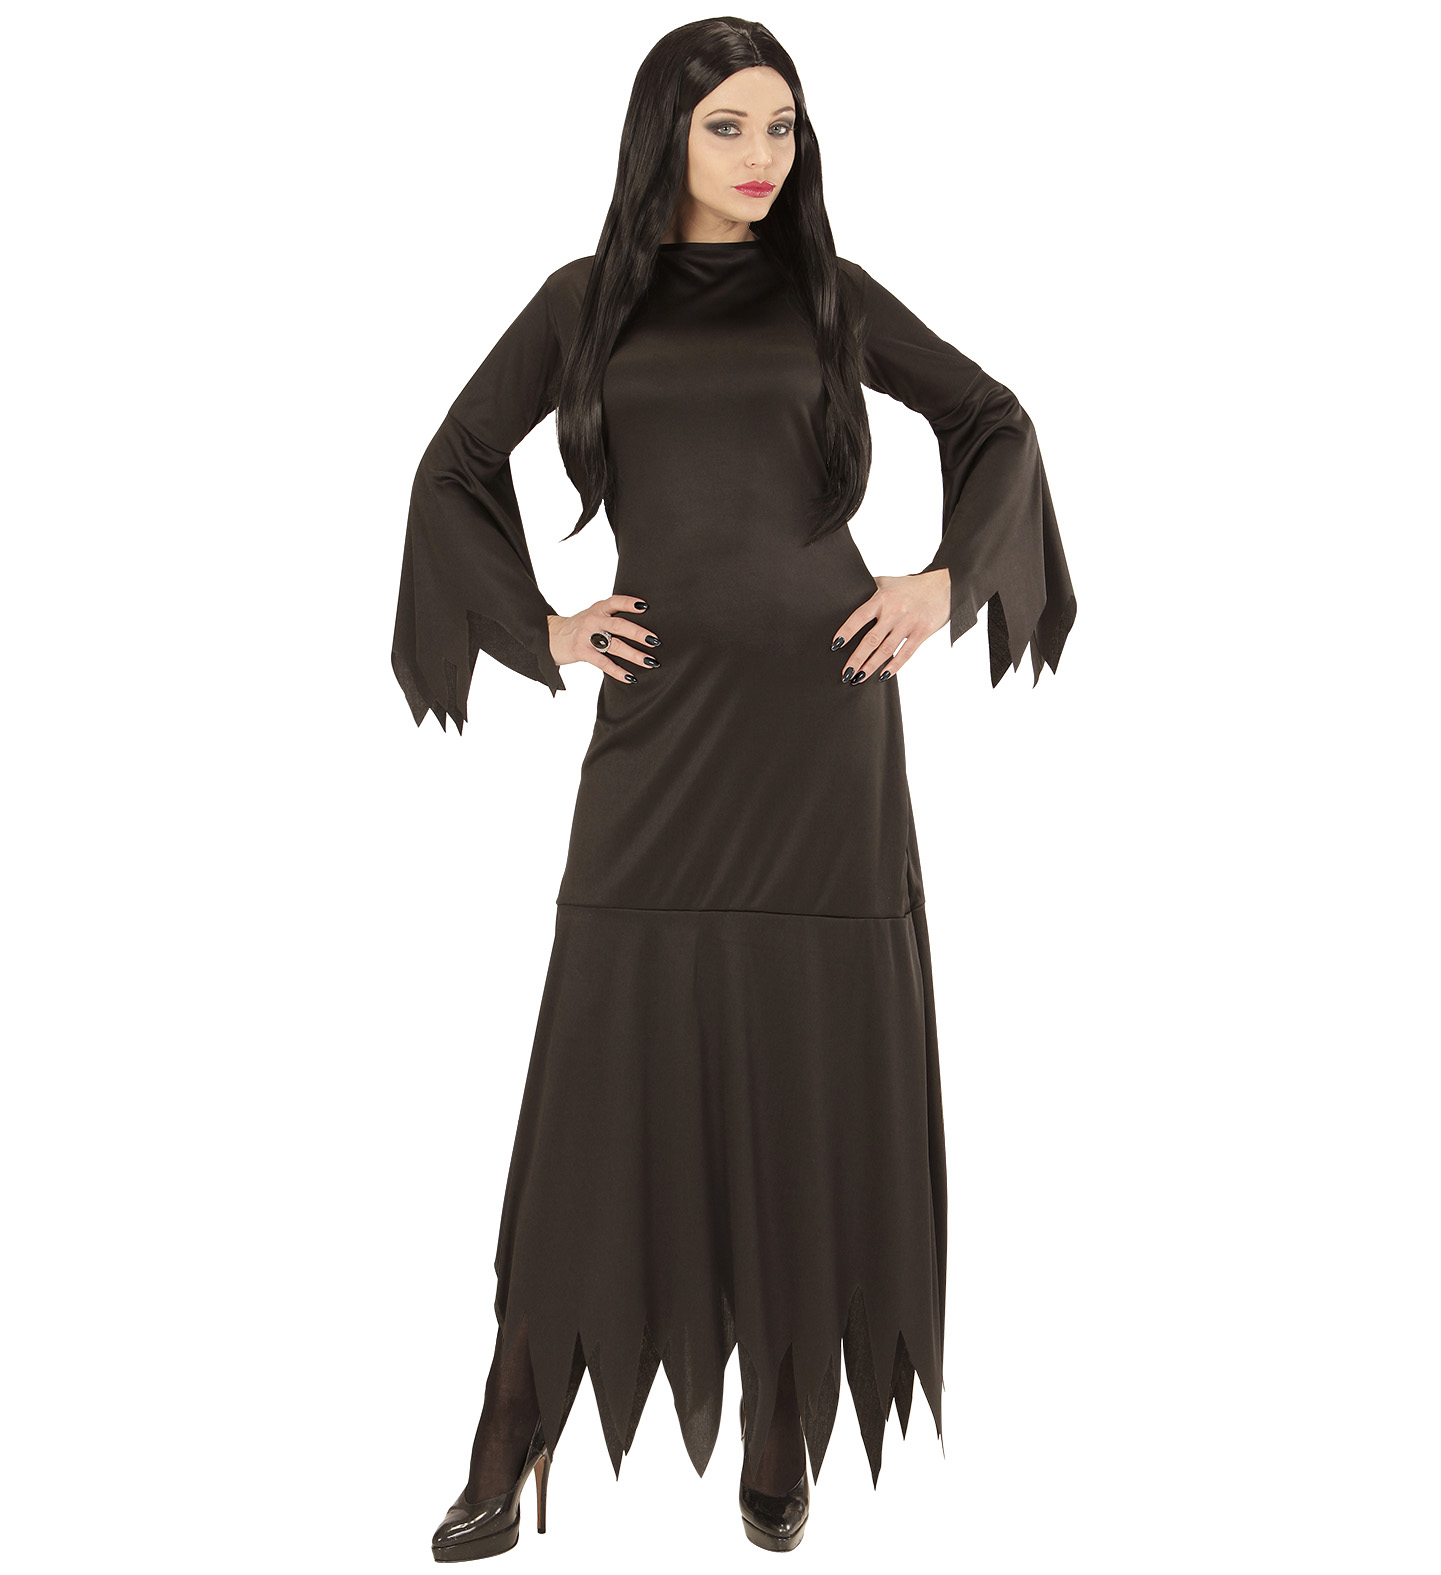 51fdafdadcba Dámský černý kostým čarodějnice